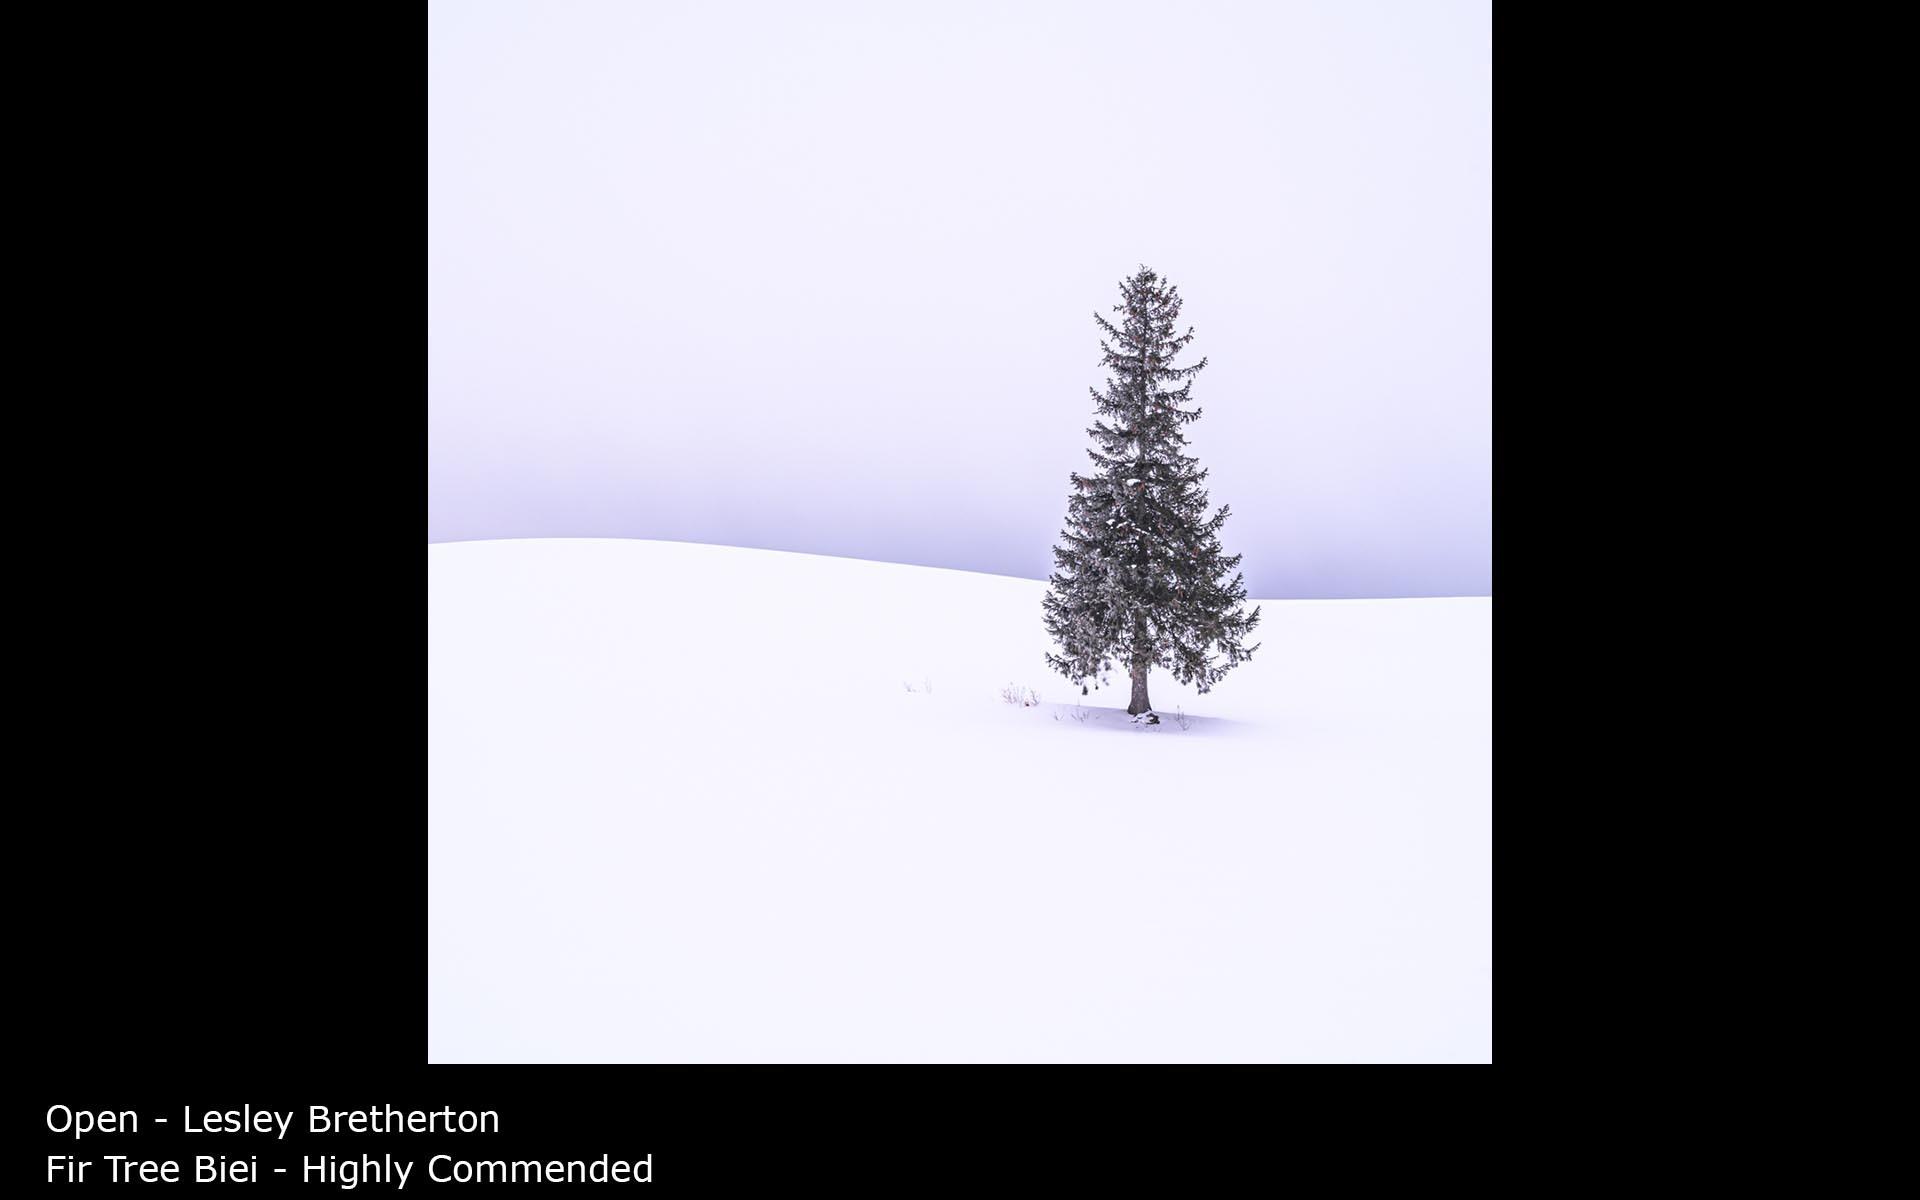 Fir Tree Biei - Lesley Bretherton